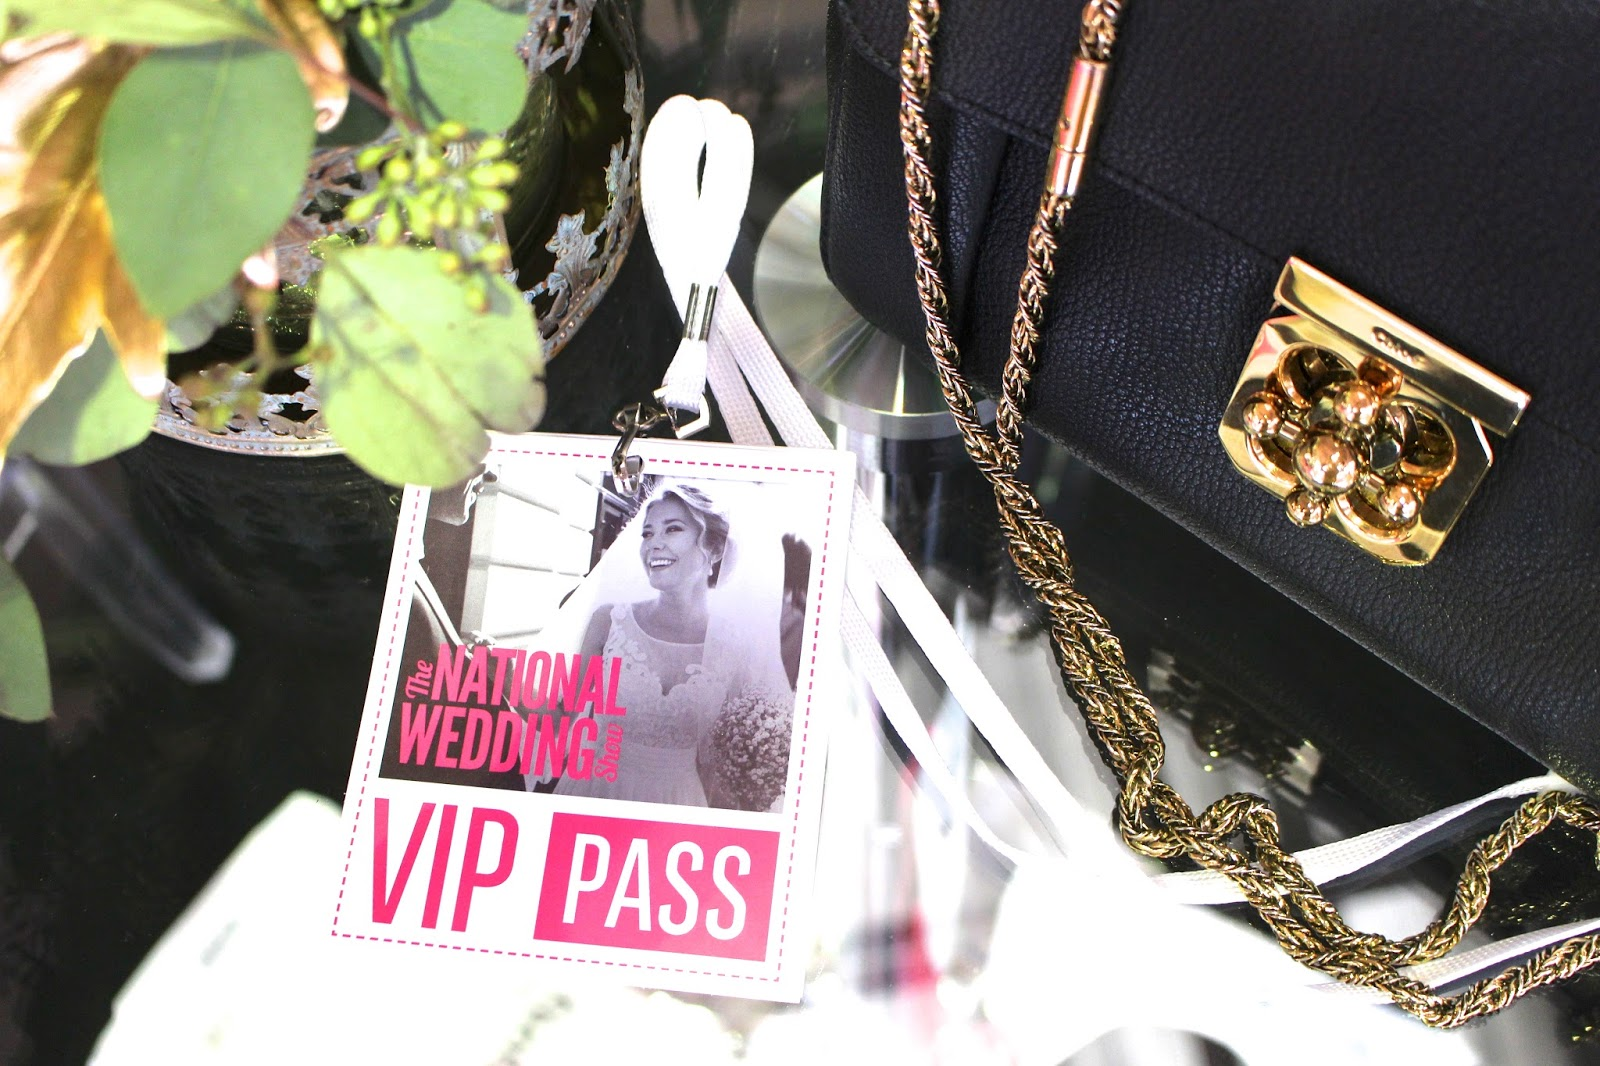 The National Wedding Show 2016 VIP Pass